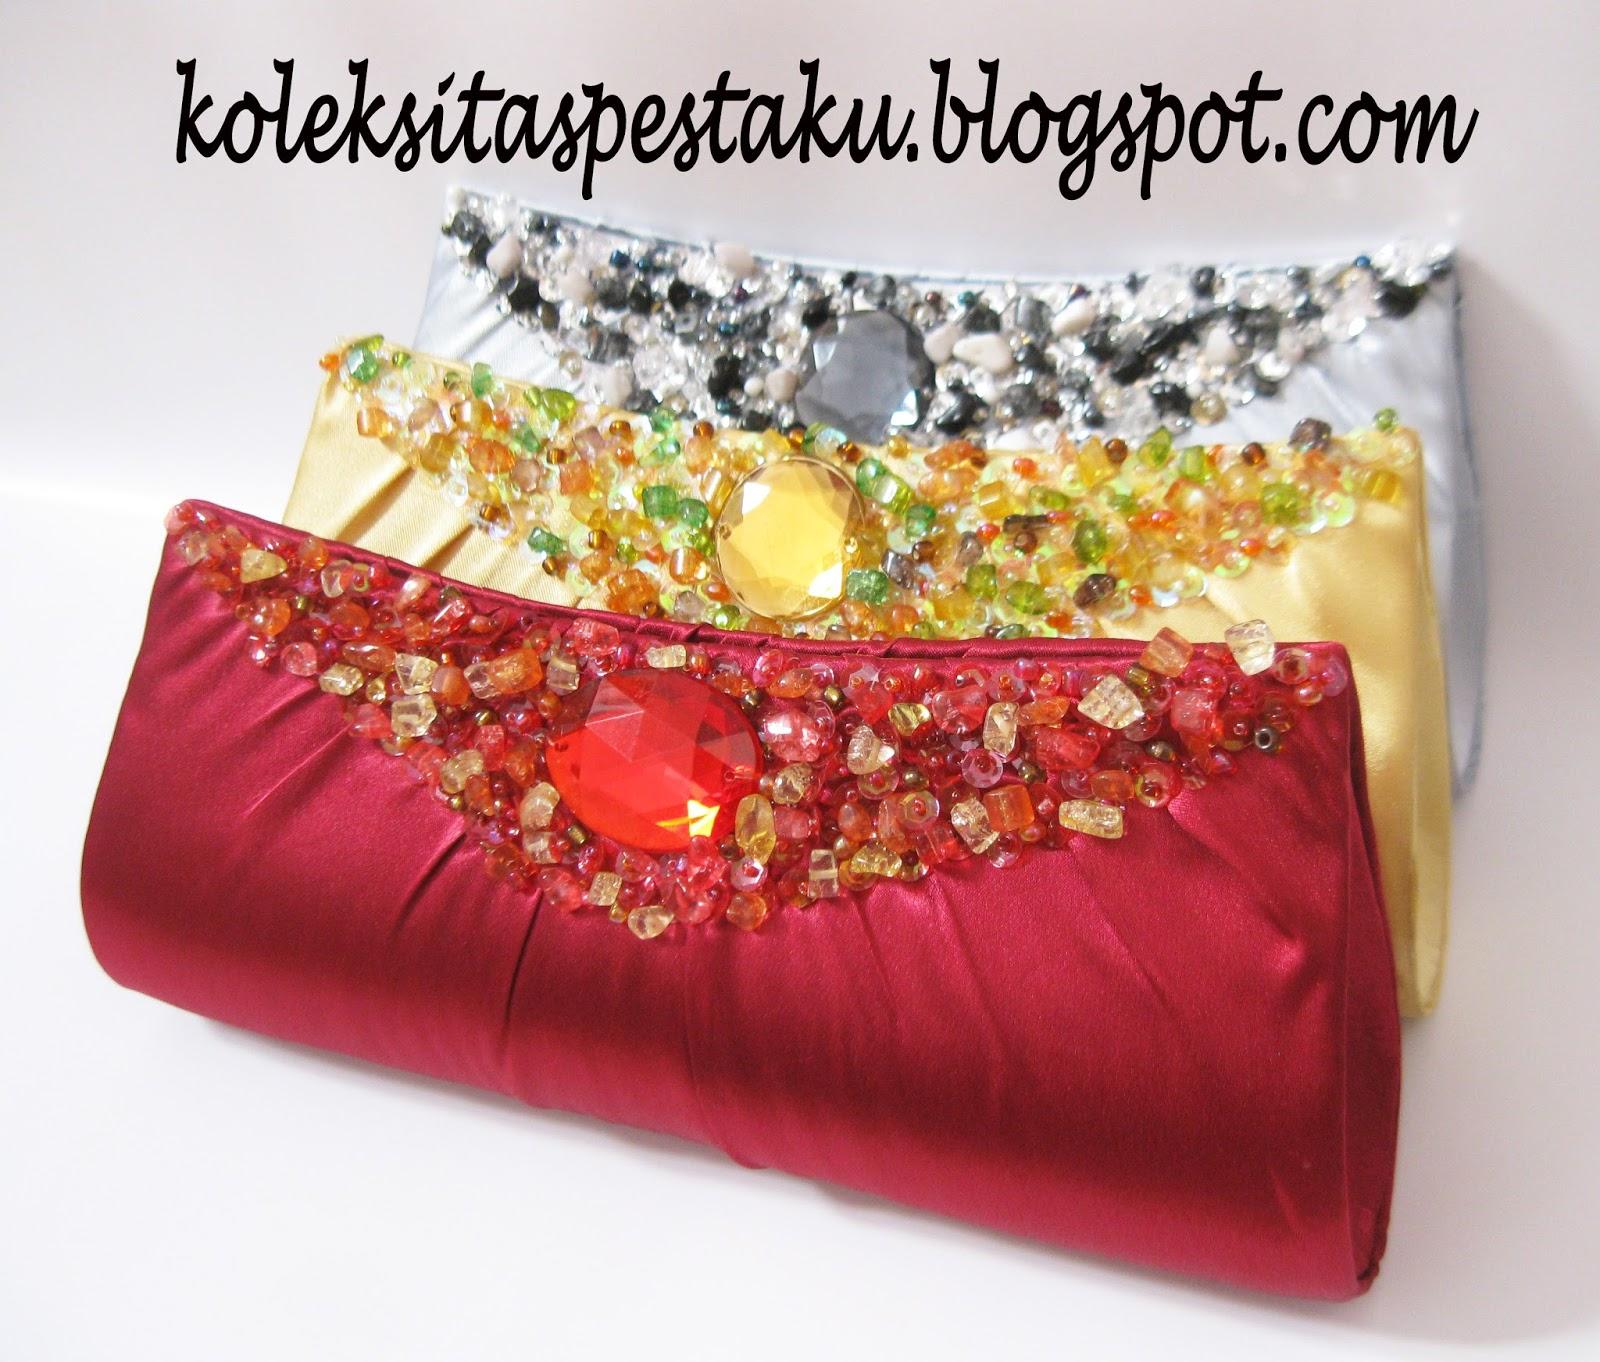 Tas Pesta Mewah Elegant Cantik Silver Gold Maroon. TAS PESTA - CLUTCH BAG  ... 9f55129c36